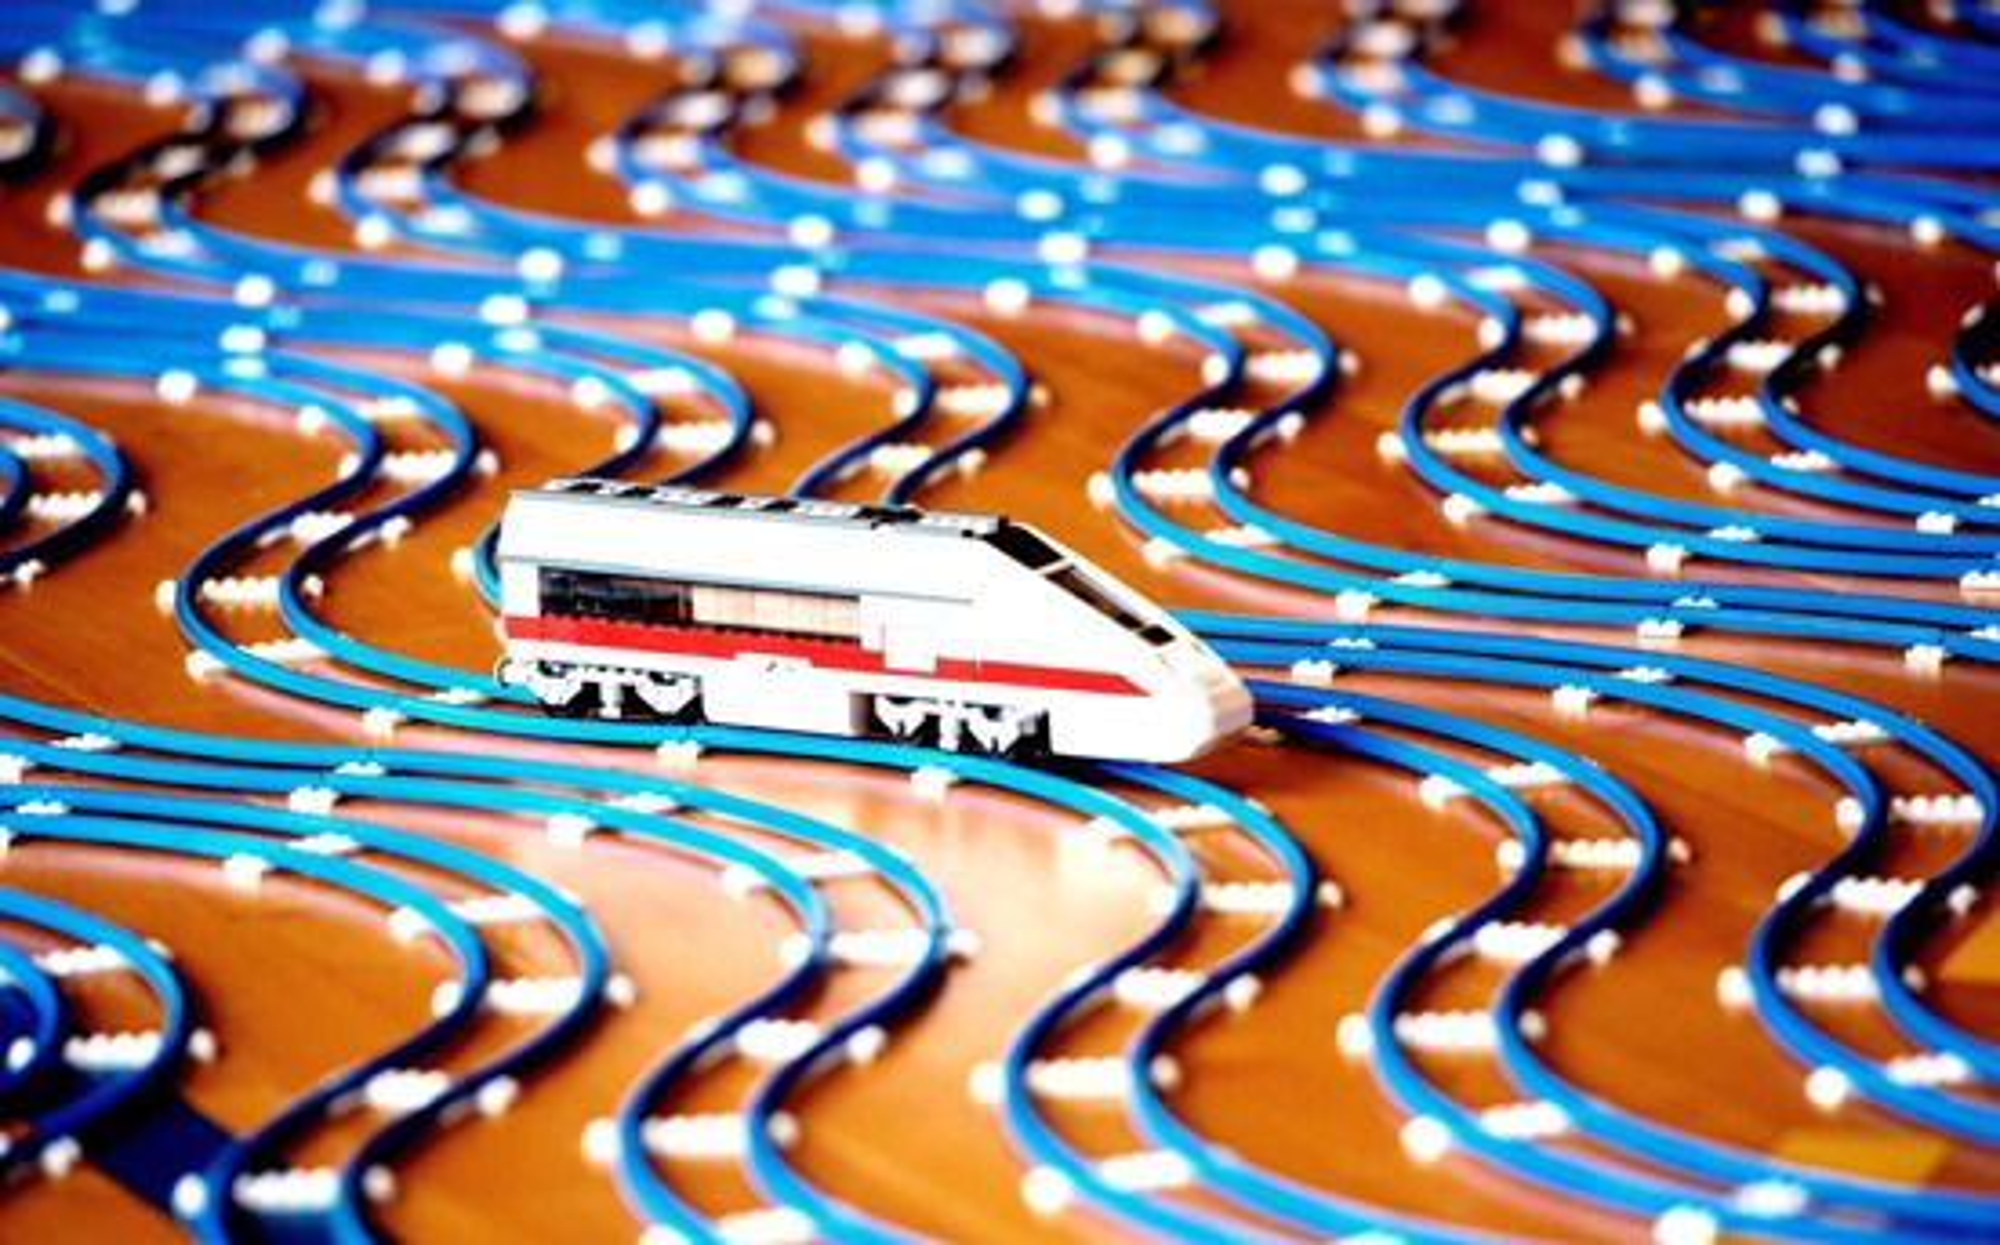 Broby Sportsefterskole har bygget verdens Lengste Lego-togbane med fire kilometer skinner.